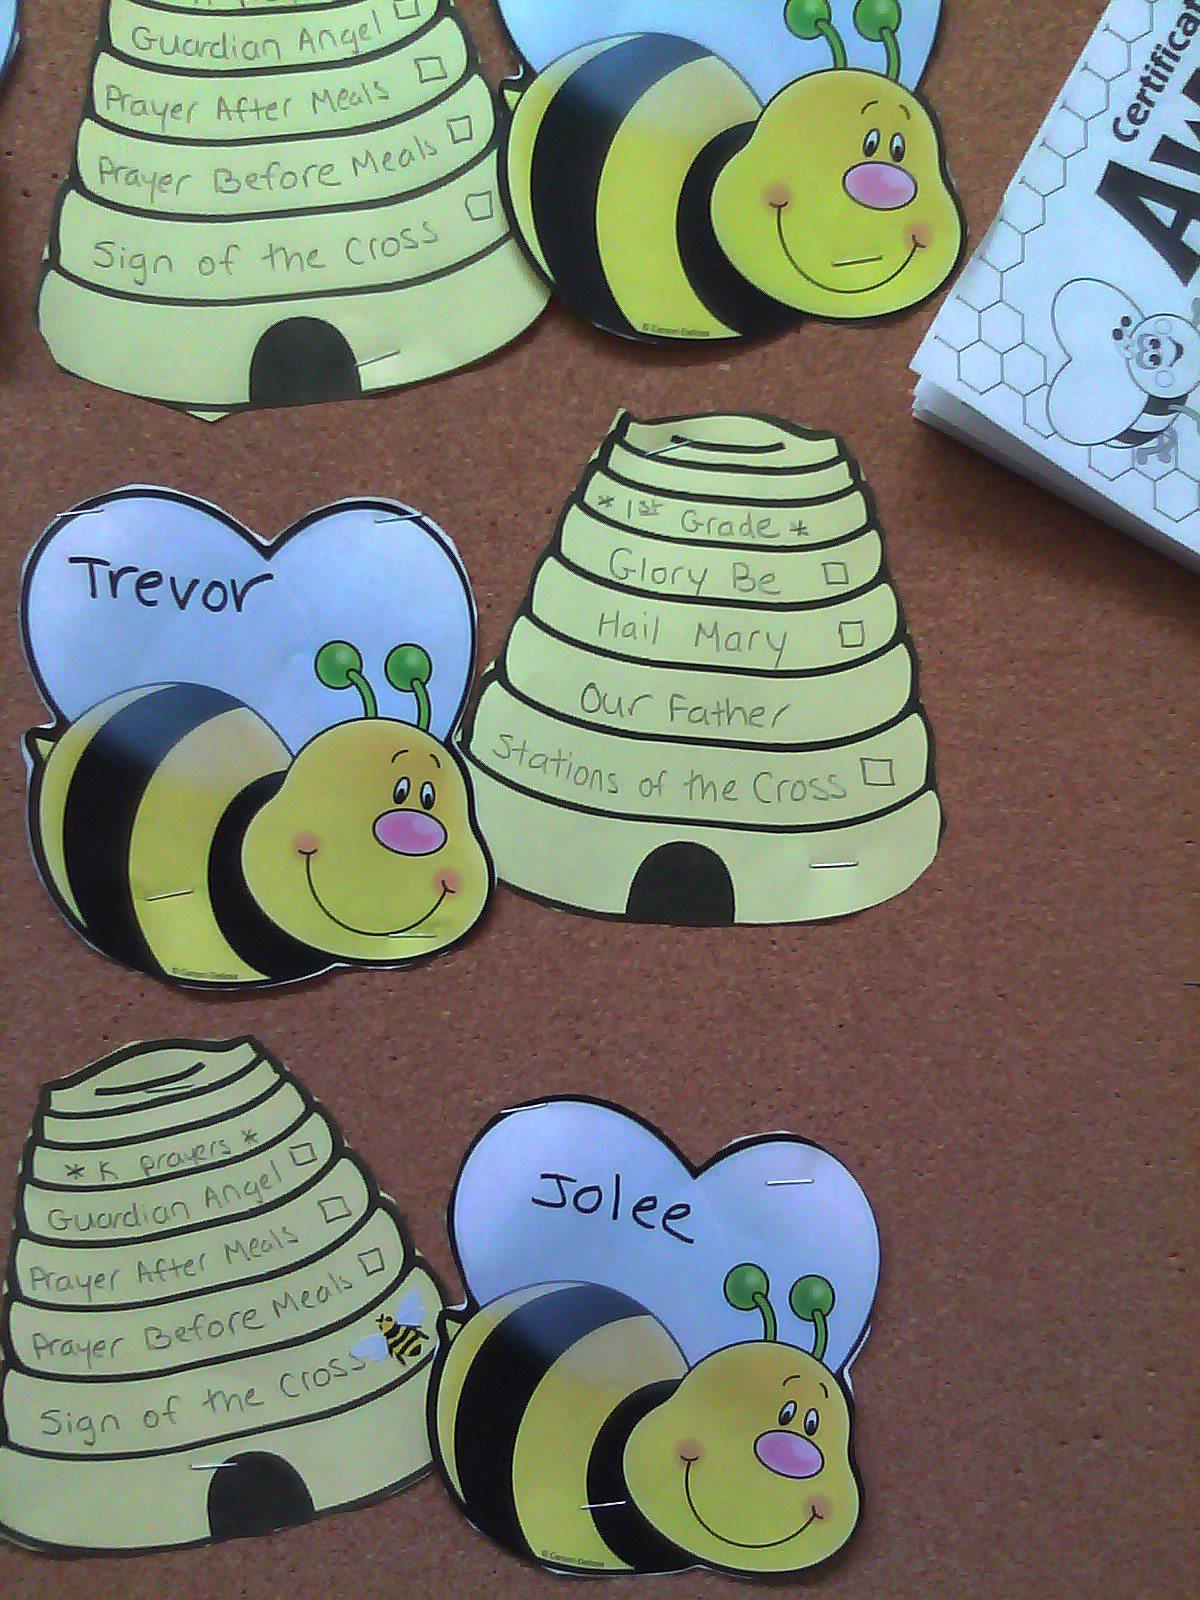 re teacher catholic religious education resources bumble bee